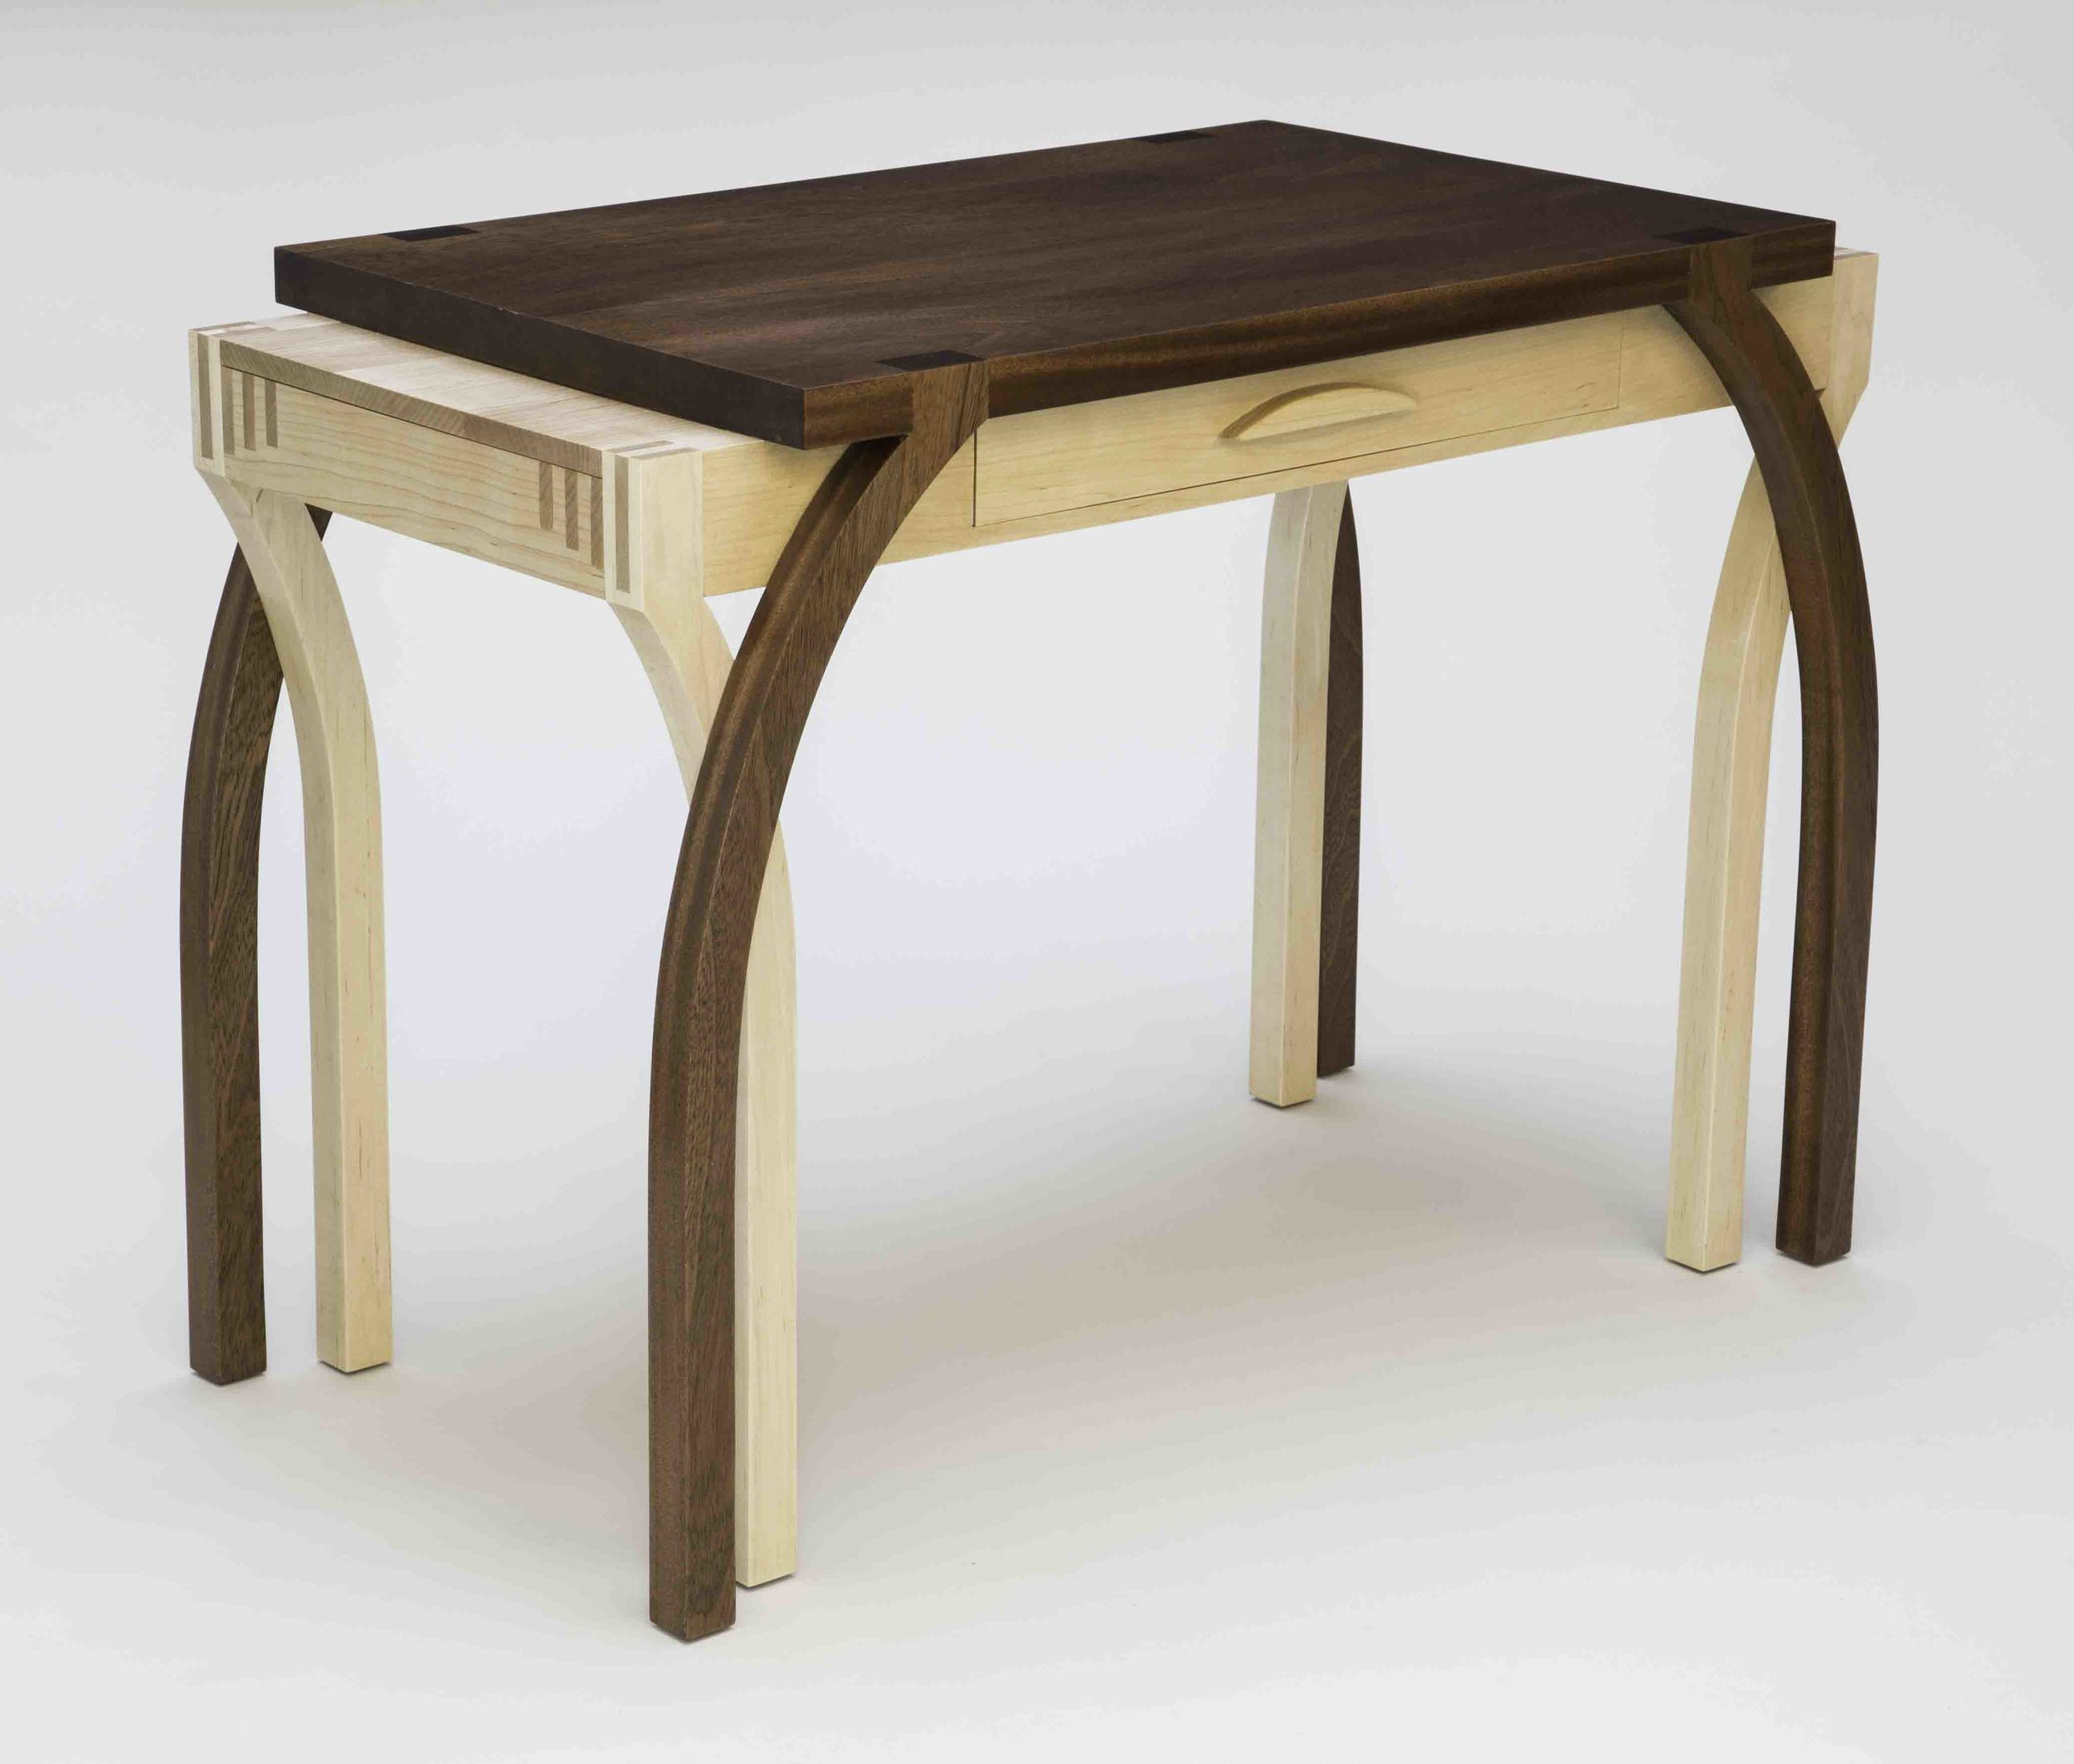 20141028 Taima Krayem, Shaker table, desk-table, 09-25-14 bowl 3-2.jpg